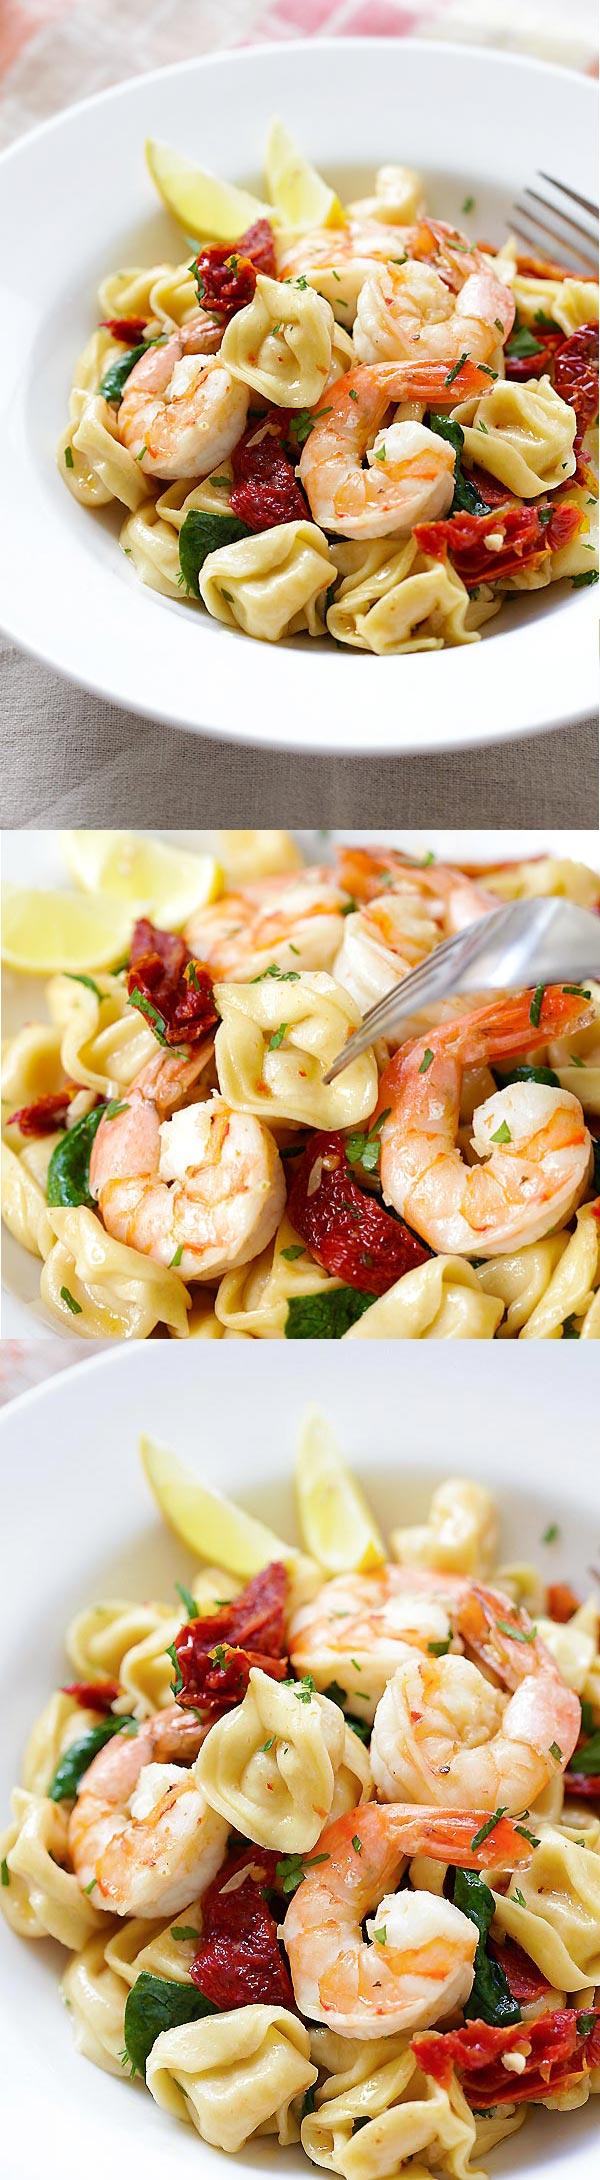 Amazing recipe for homemade Garlic Shrimp Tortellini. Budget-friendly and the taste is better than any Italian restaurant's!   rasamalaysia.com